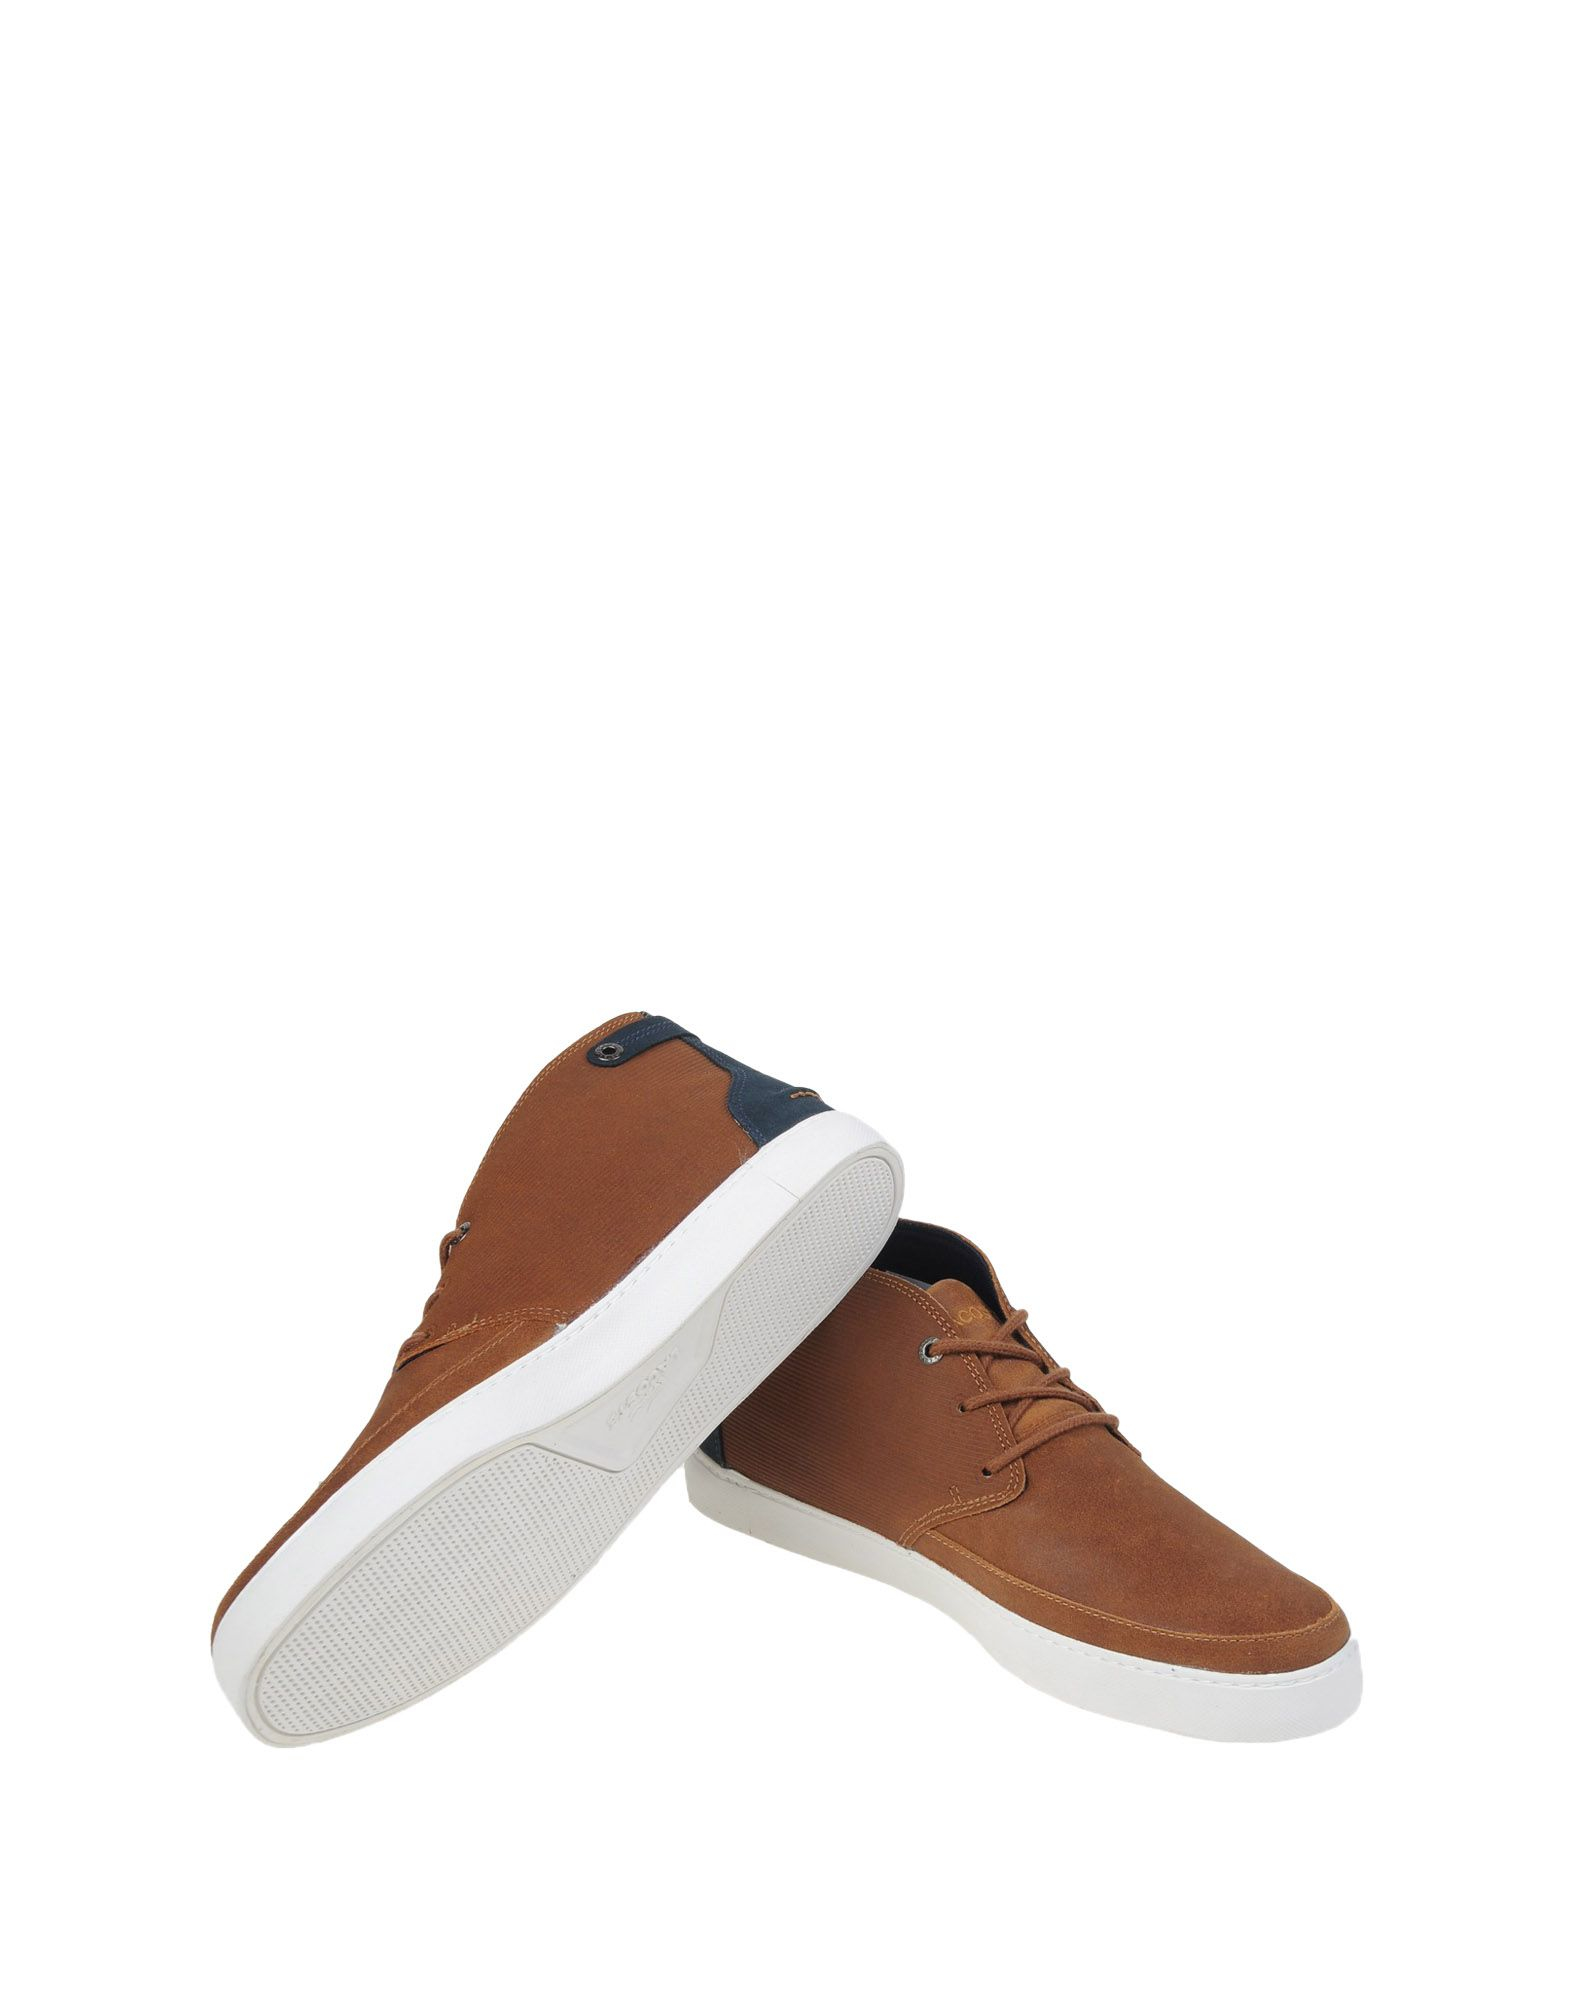 lyst lacoste hightops amp sneakers in brown for men